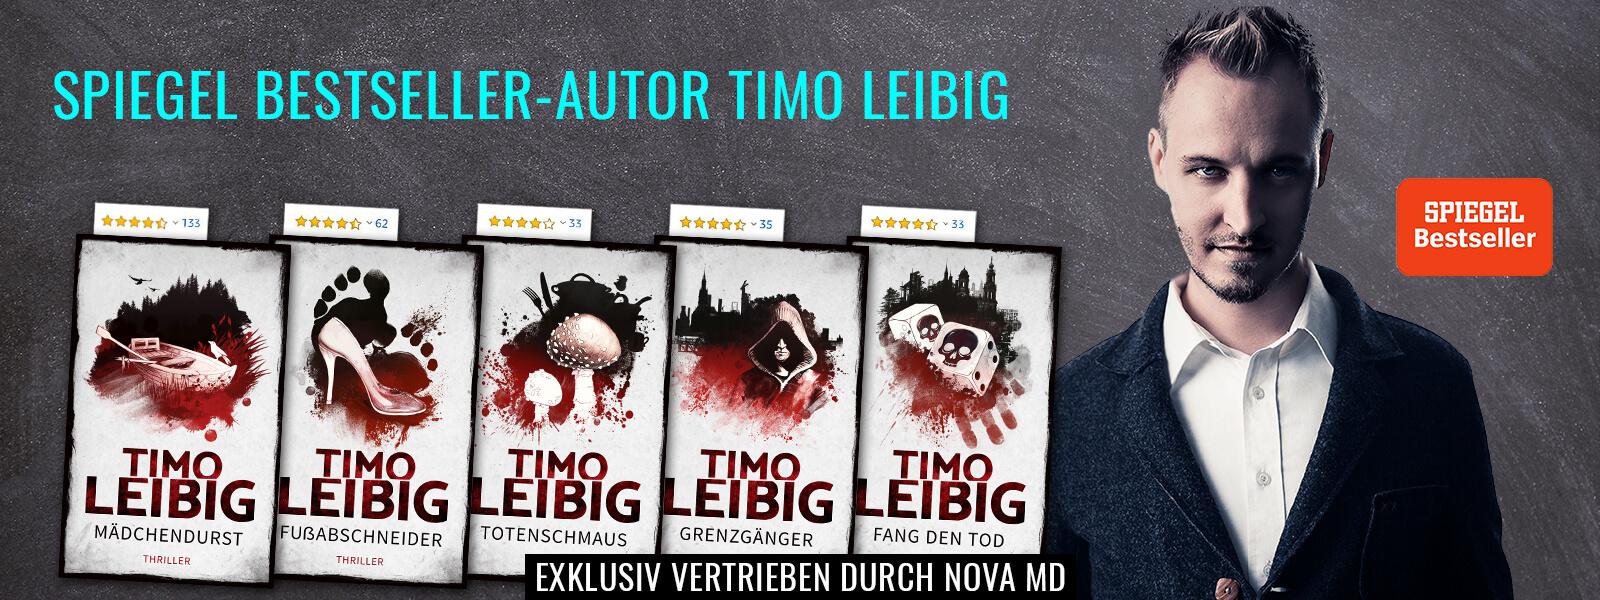 Timo Leibig Selfpublisher und Bestseller-Autor